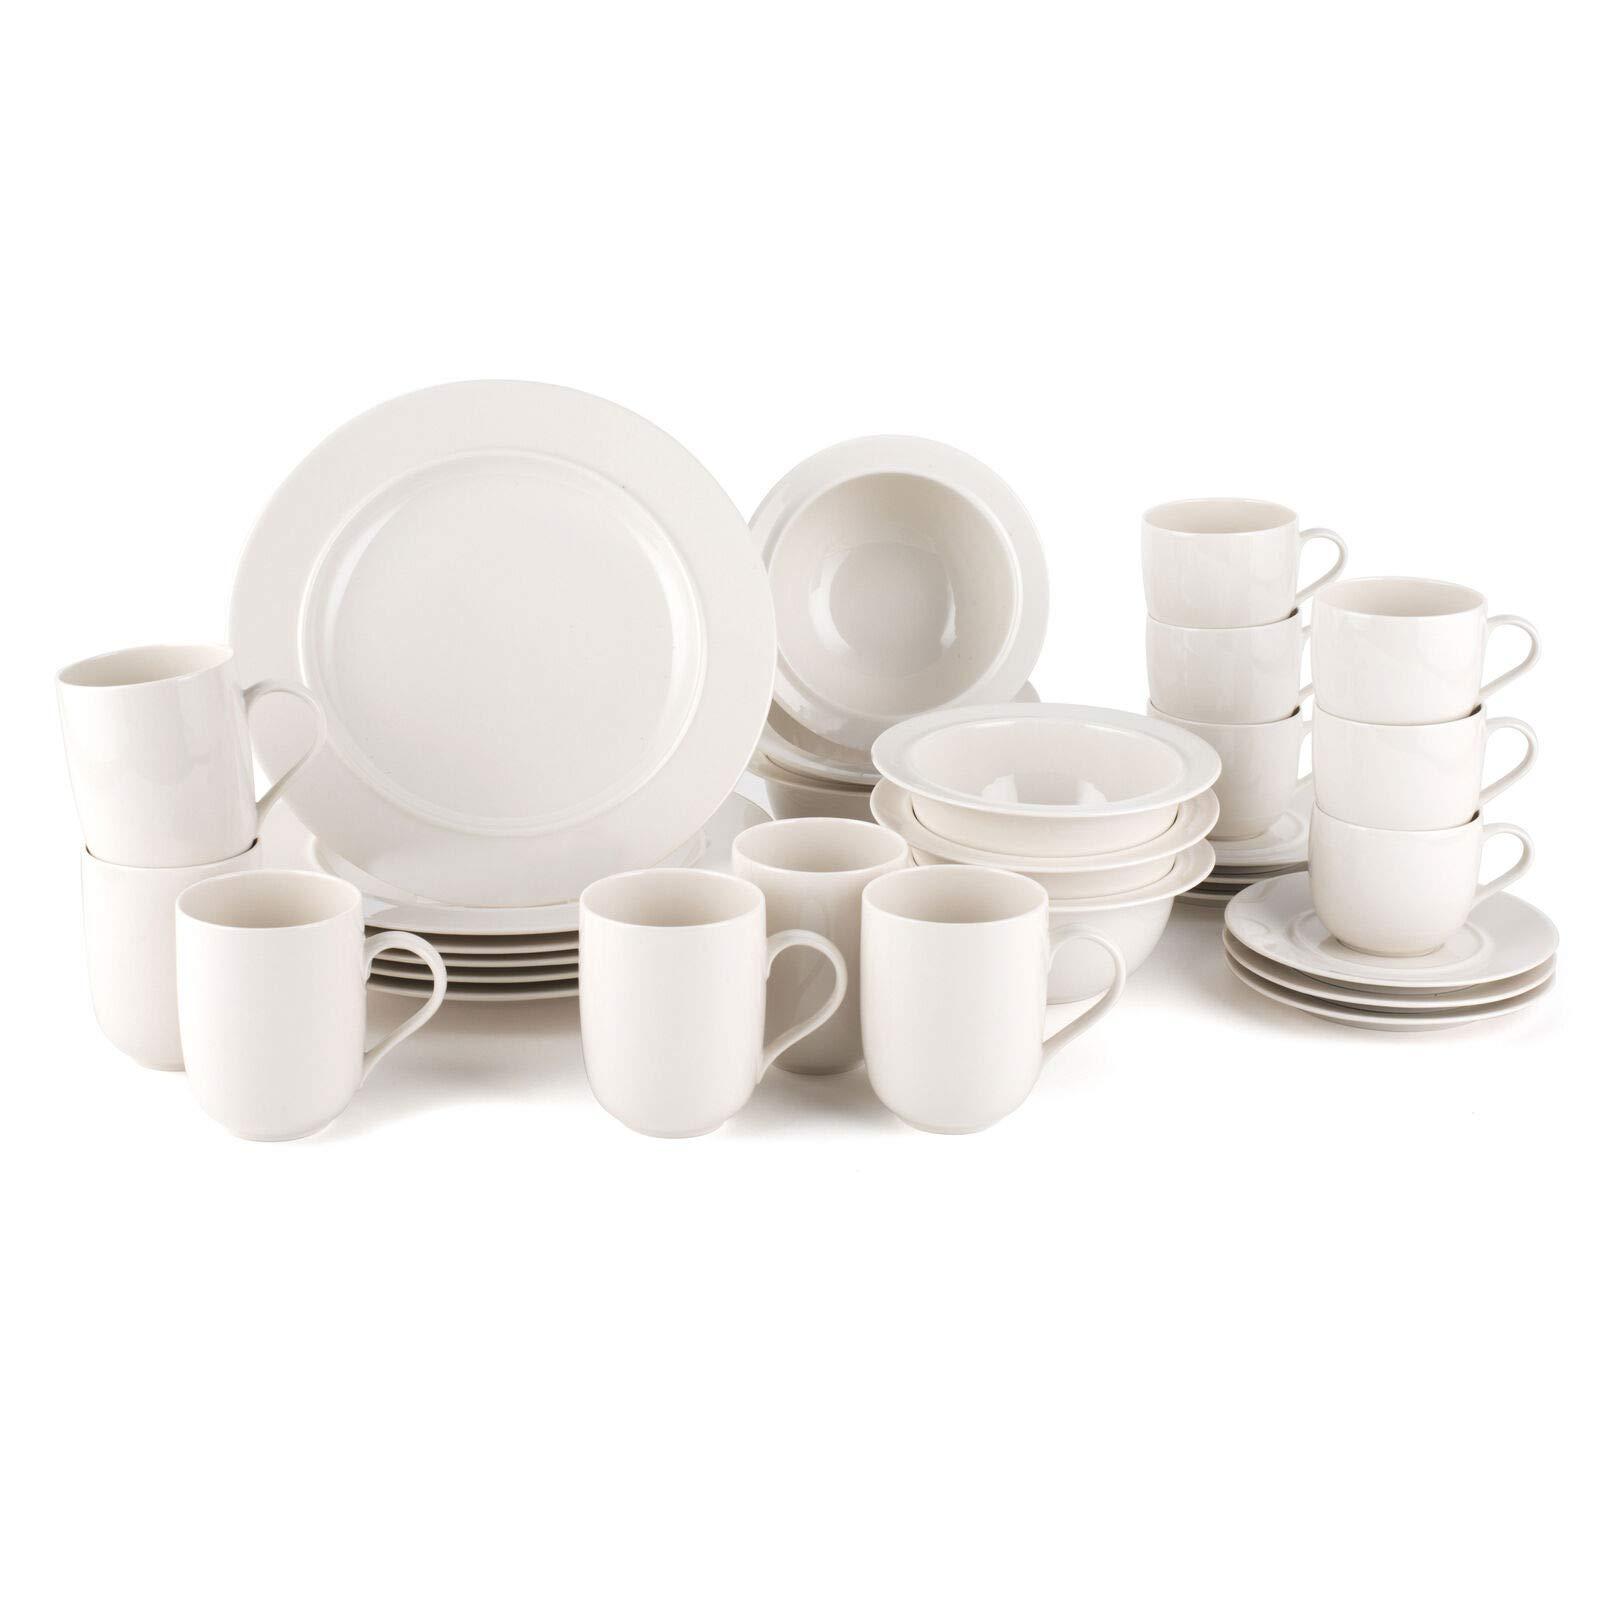 Alessi La Bella Tavola Porcelain 6 Place Setting Breakfast And Dinner Dining Set Buy Online In El Salvador At Elsalvador Desertcart Com Productid 61735879